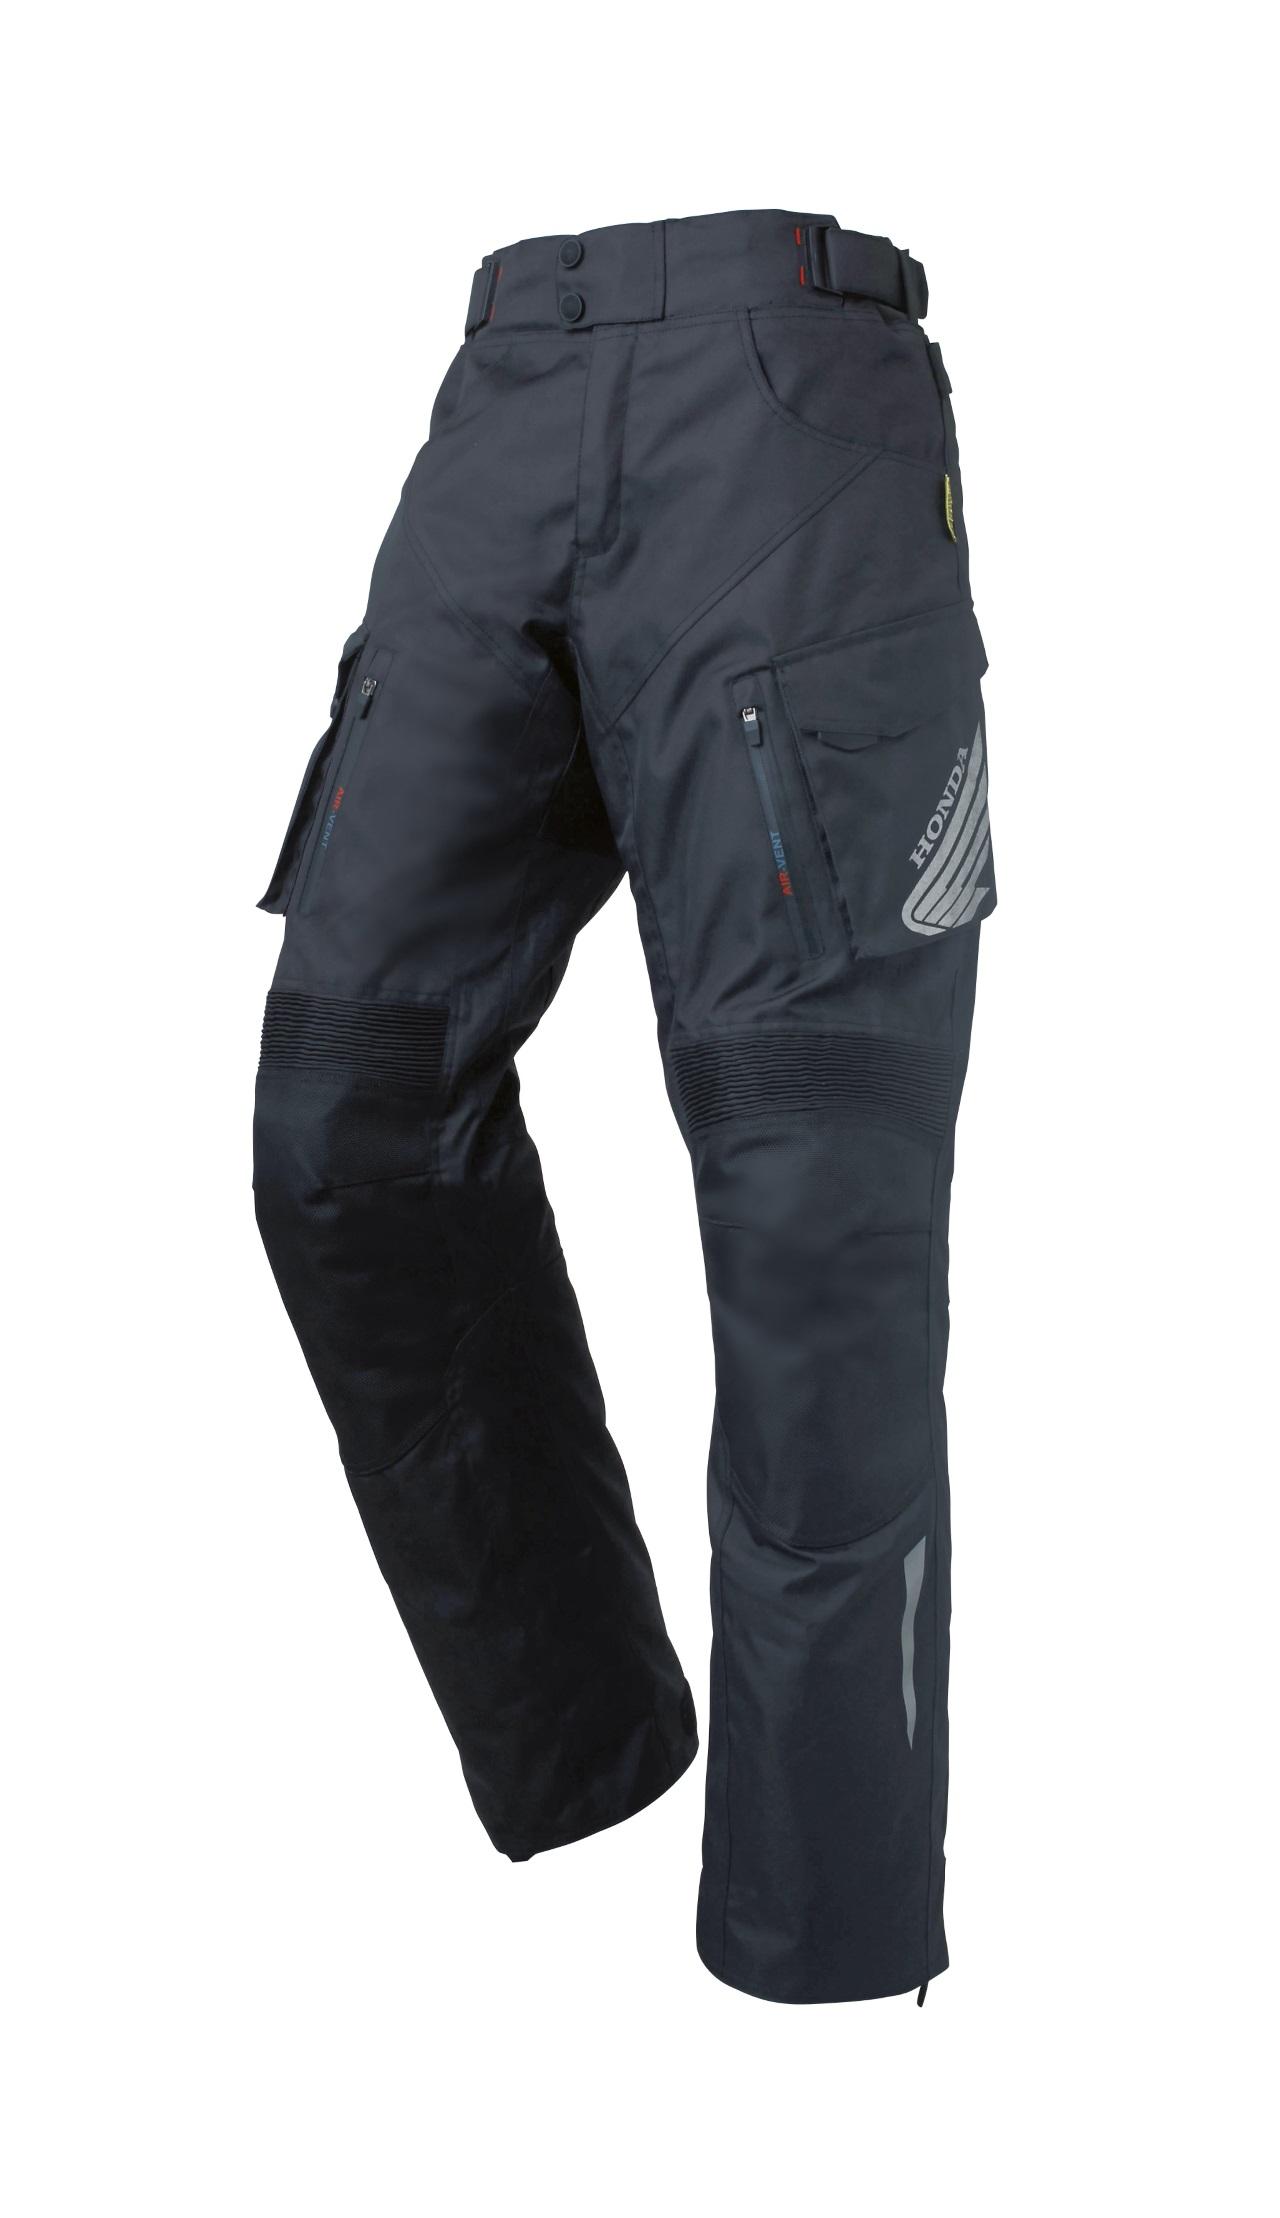 Protect Riding Winter Pants